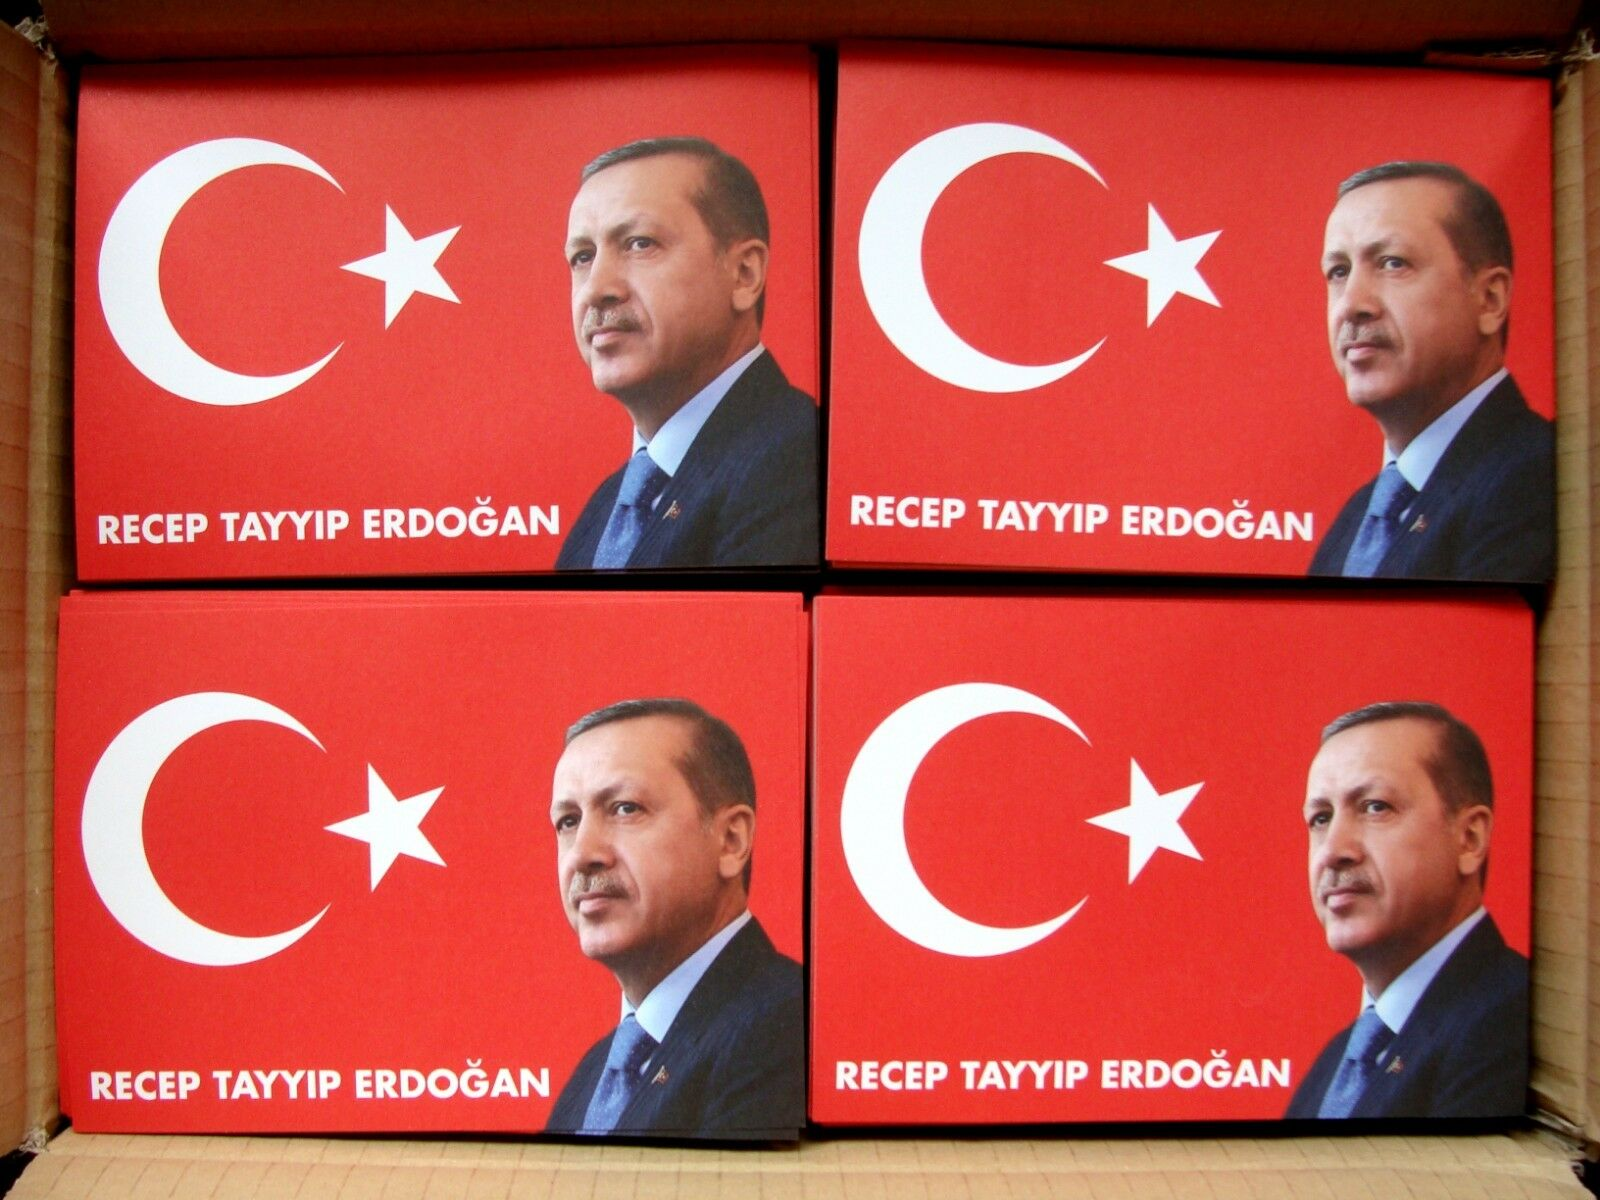 Up to 1000 Recep Tayyip Erdogan Aufkleber Türkei Türkiye AKP Turkey AK PARTi NEU